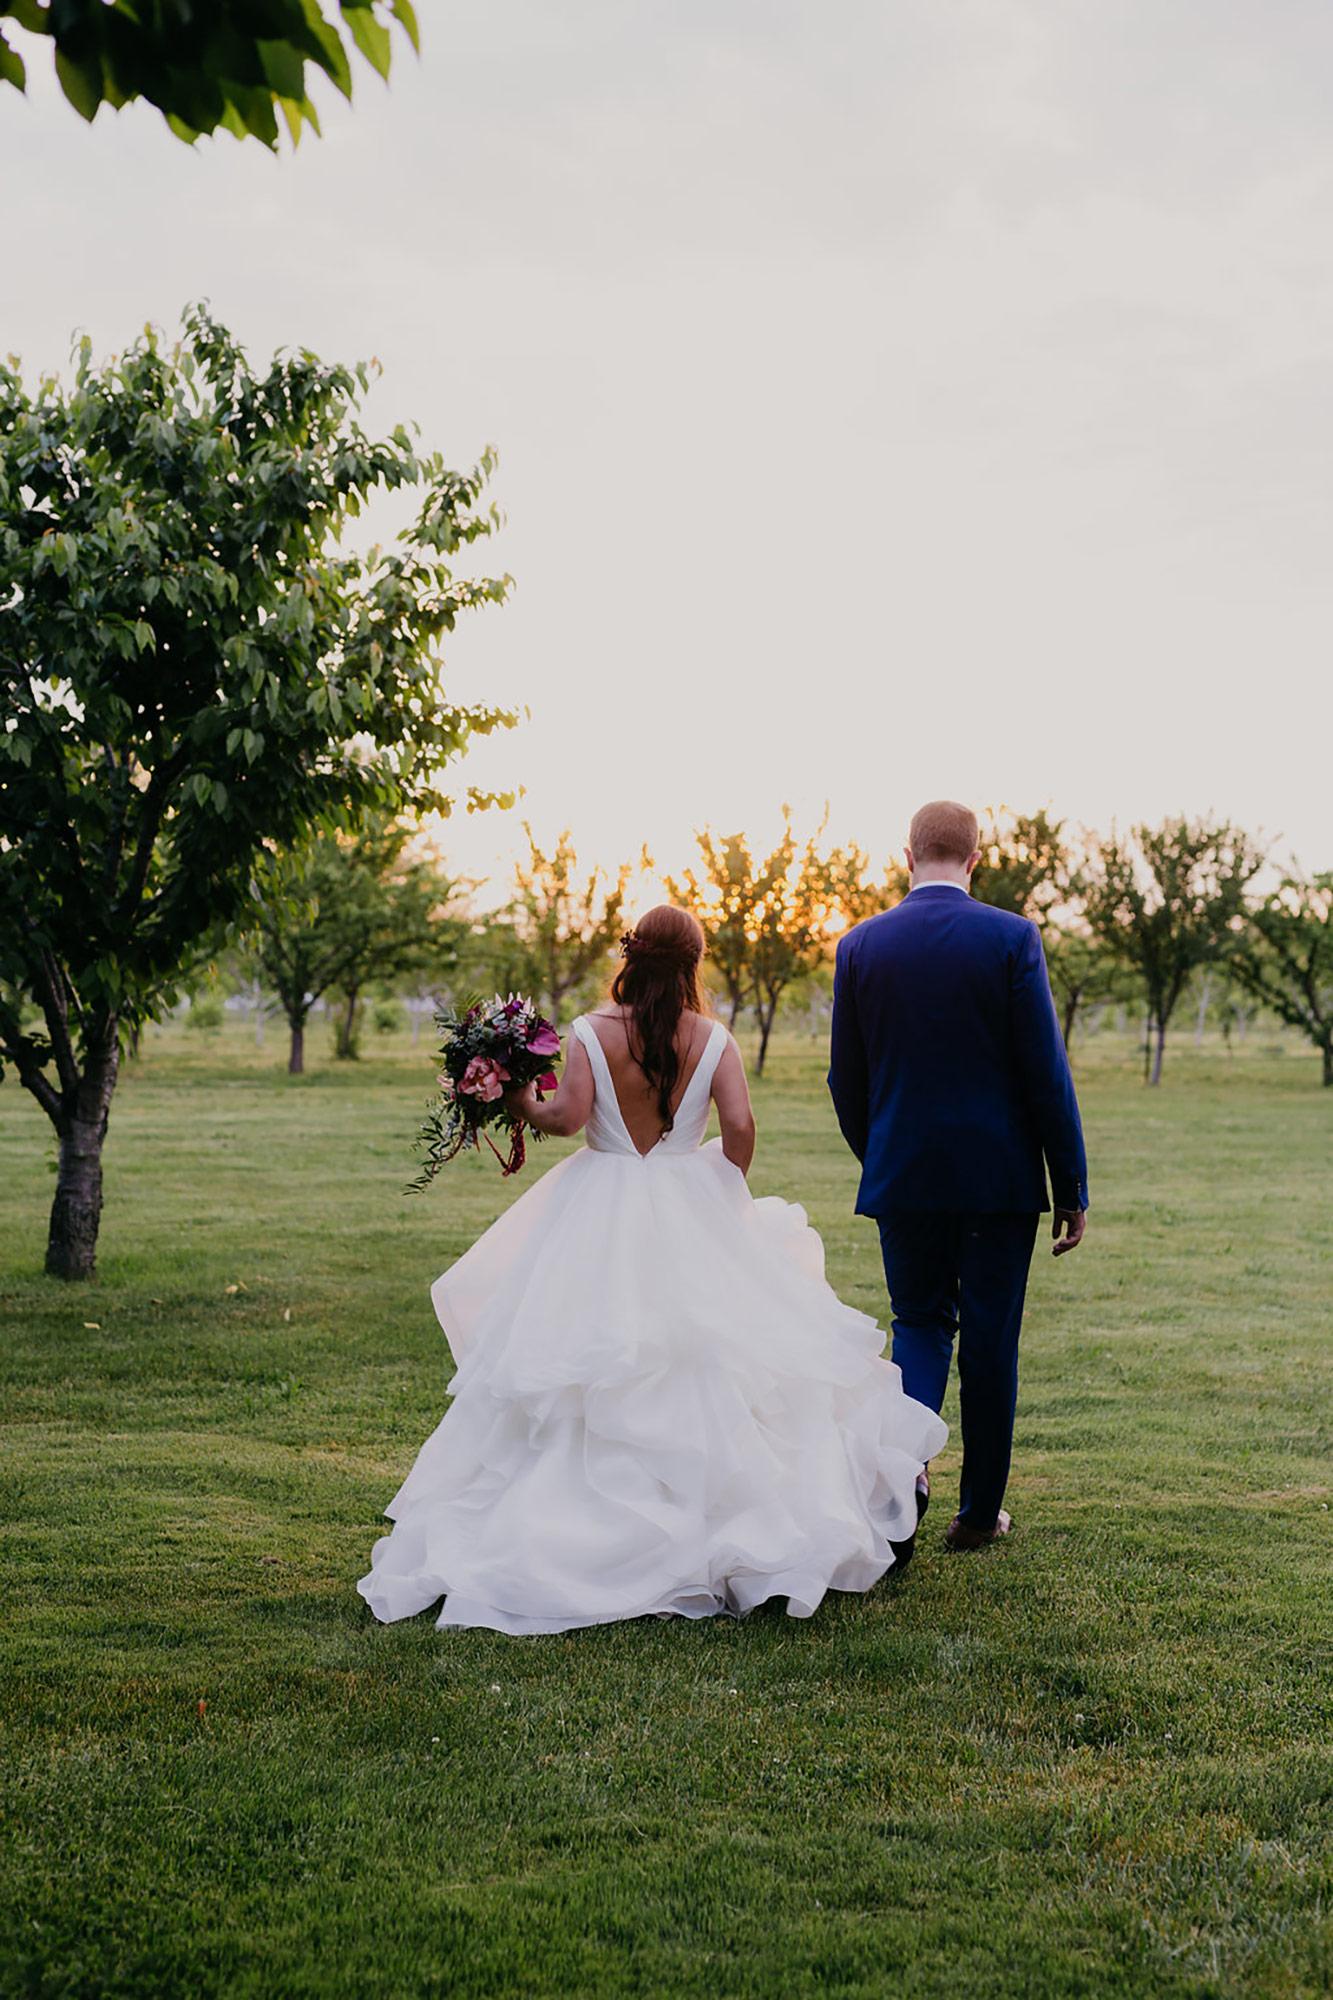 Kurtz-Orchards-Wedding-Niagara-wedding-Vineyard-Bride-Photography-by-Kayla-Rocca-048.JPG